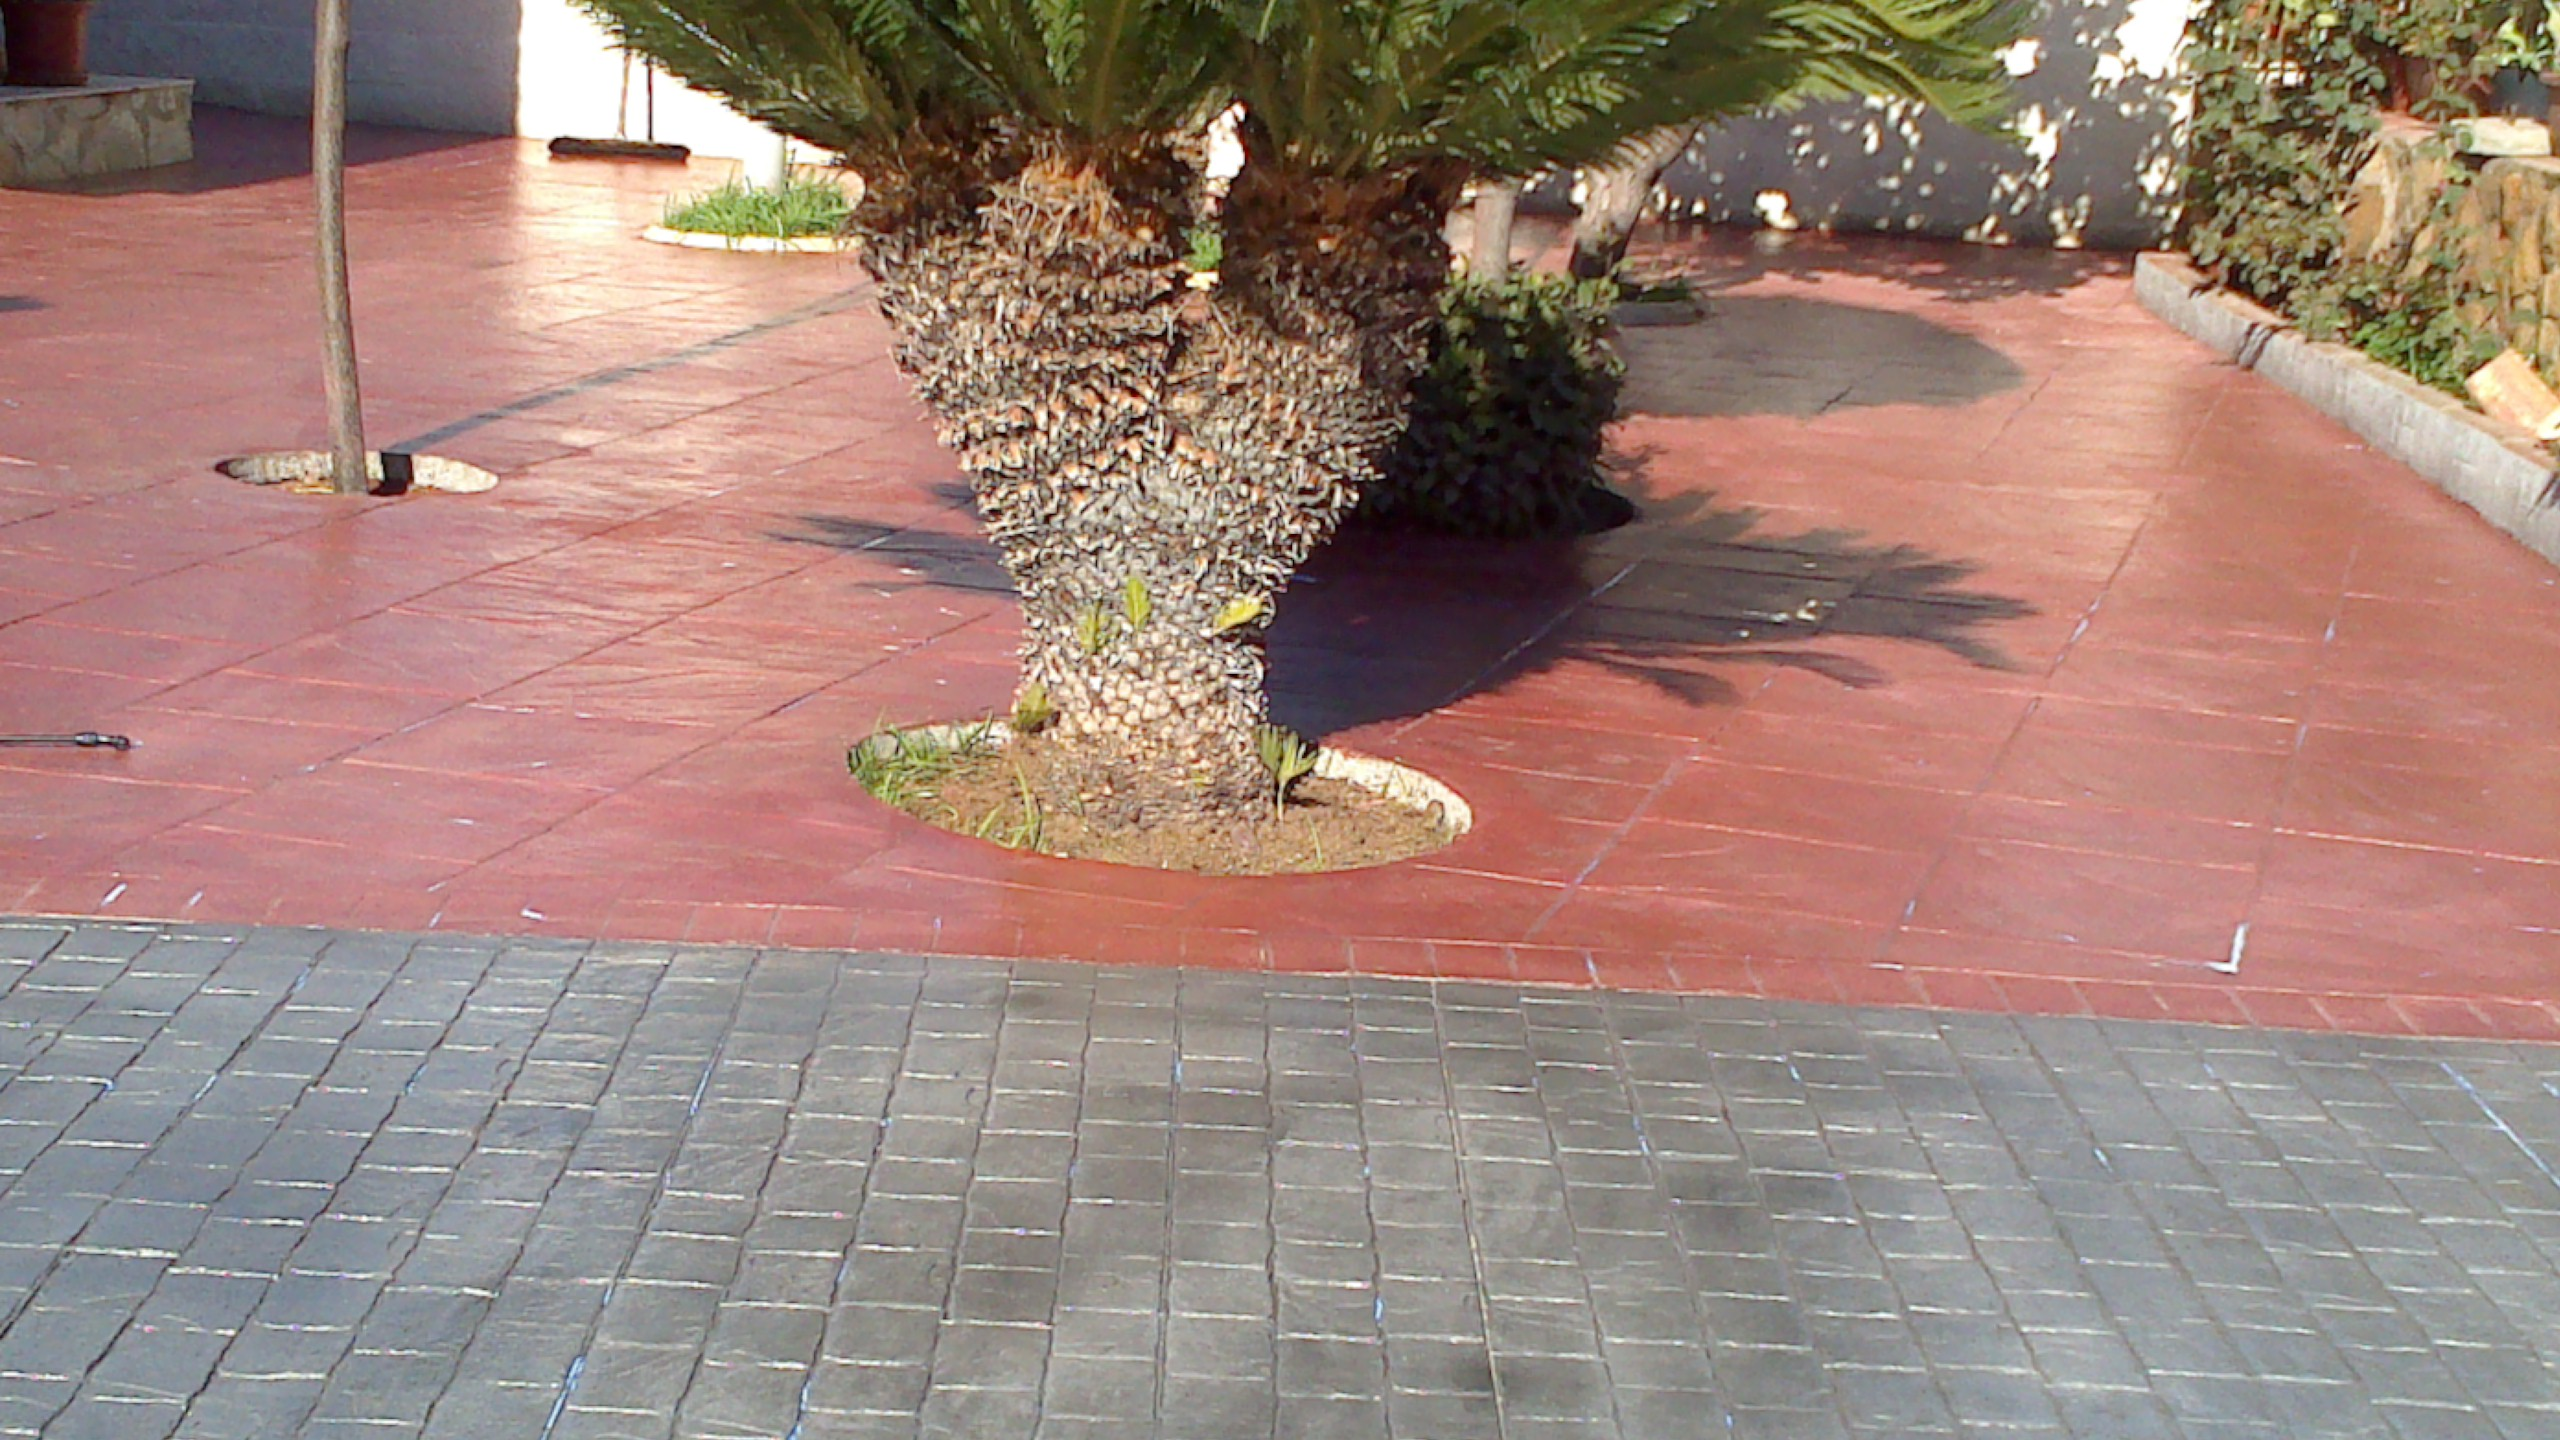 Preguntas frecuentes al instalar pavimentos de hormig n for Hormigon para pavimentos